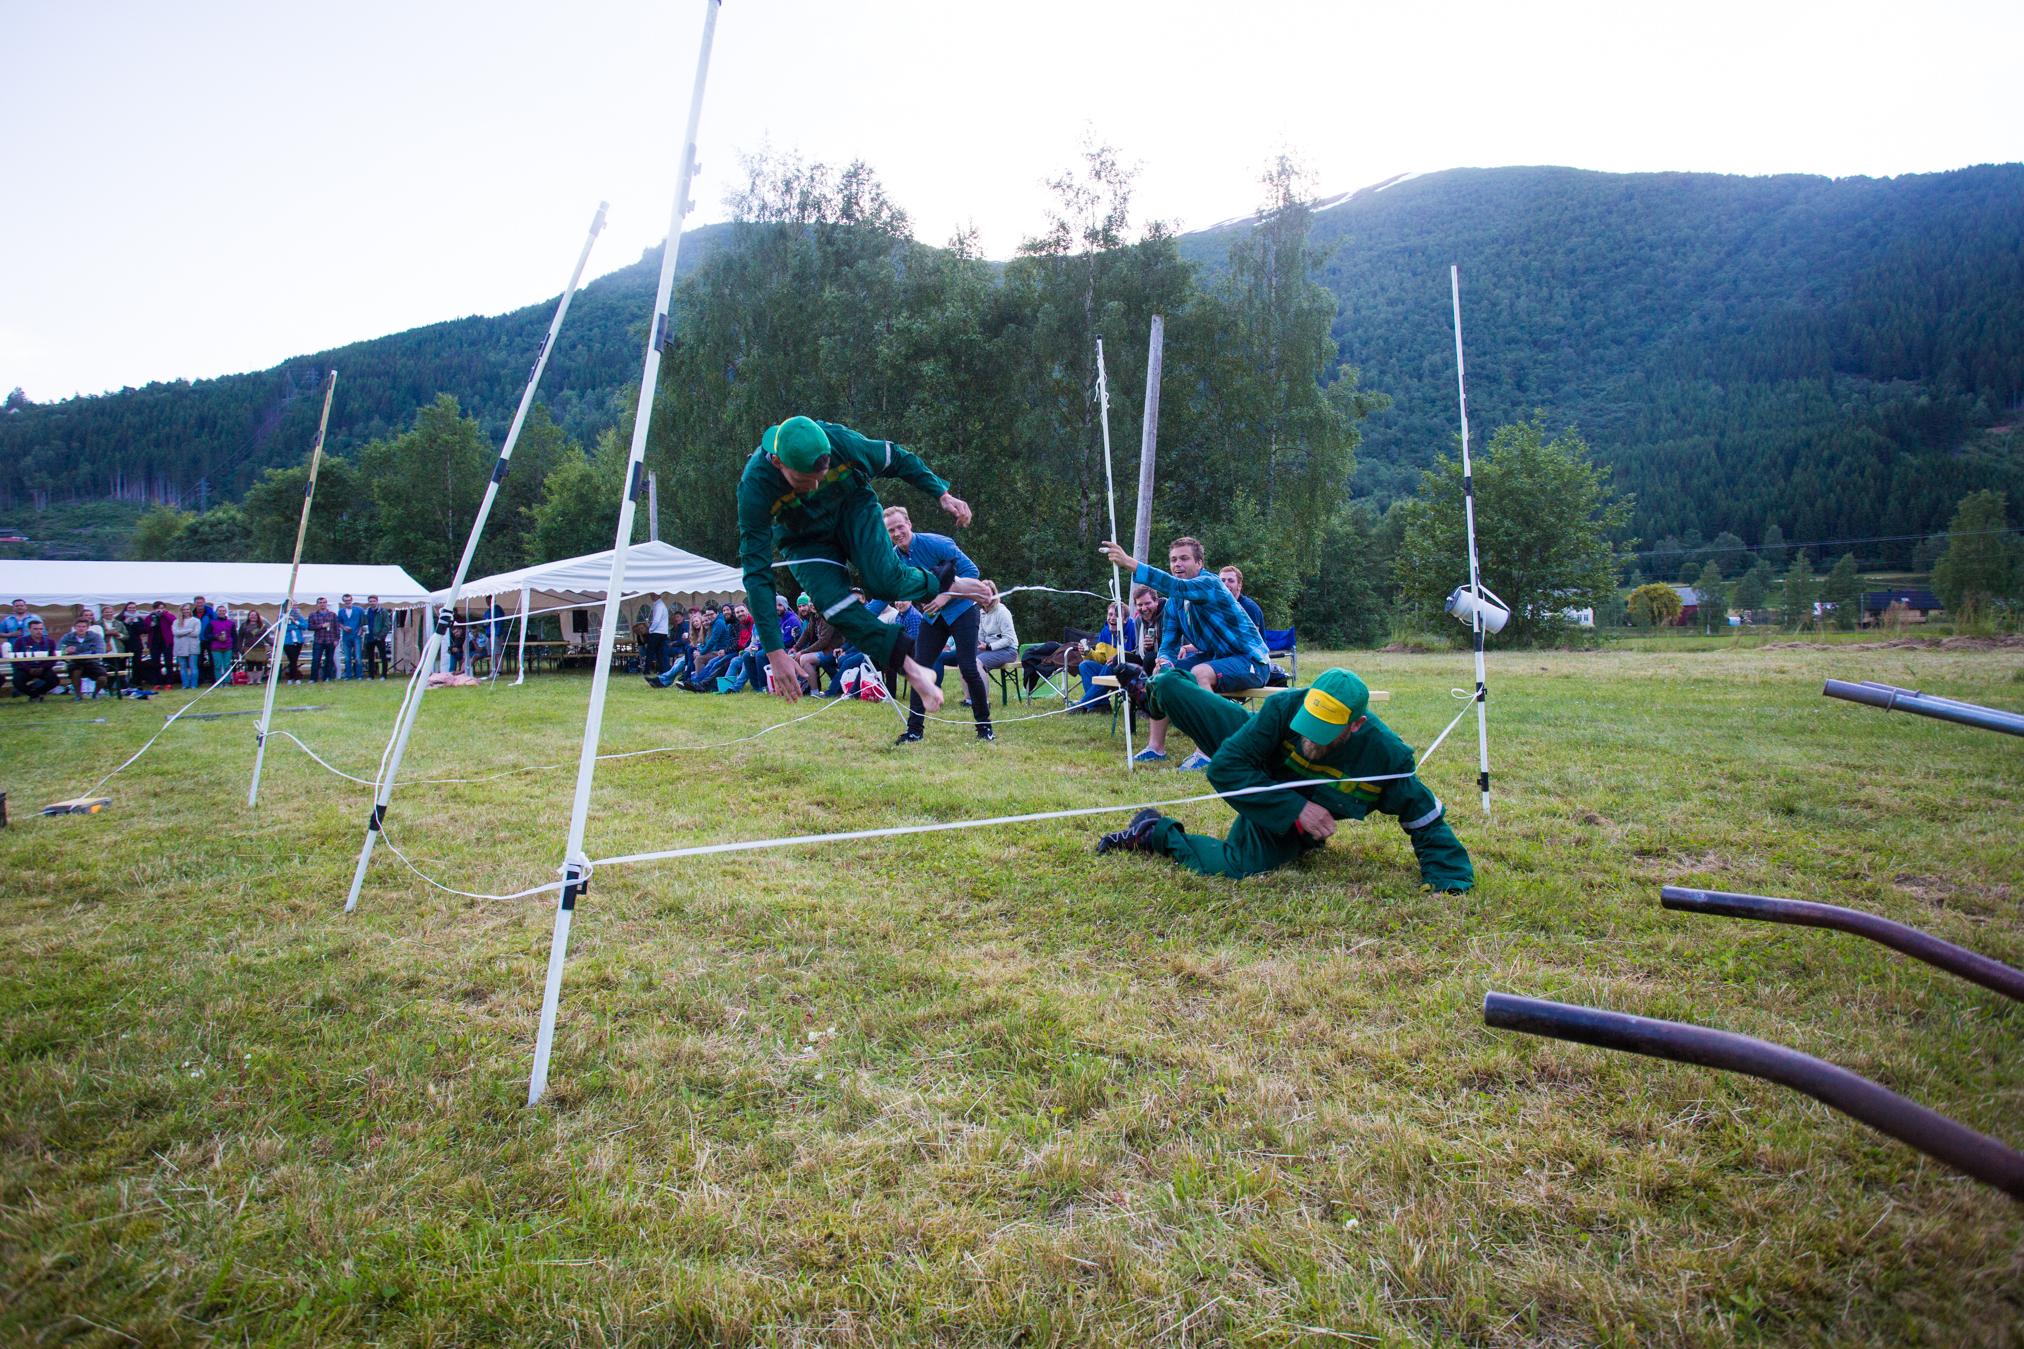 070715_fausko_valldal_valldalsummergames_lørdag_mefjellet_valldølen_crapcamp-86.jpg